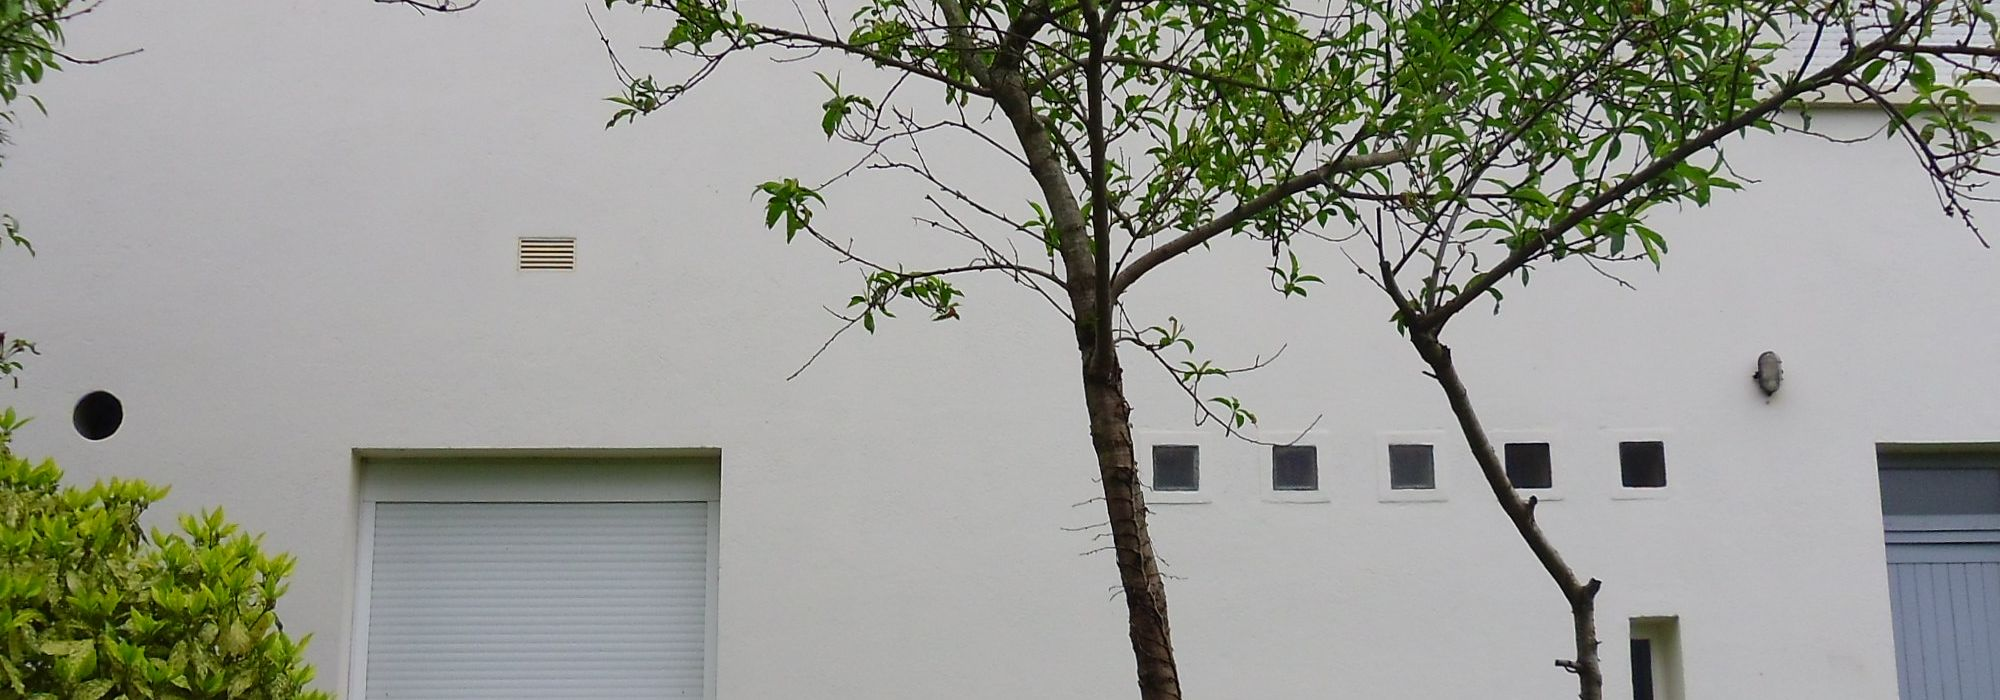 SAINT AVERTIN – Maison 4 chambres – 739m² de terrain